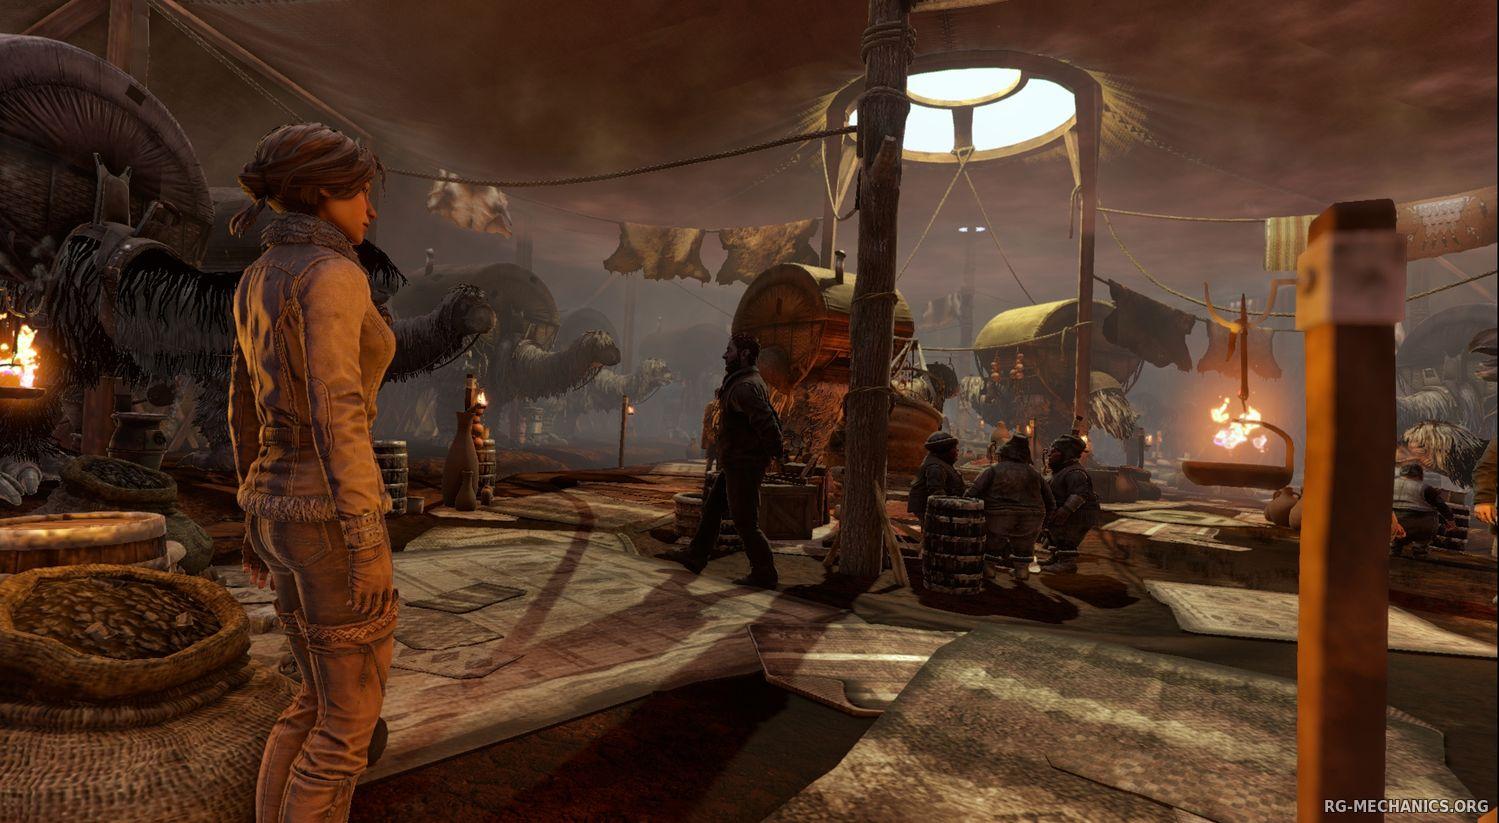 Скриншот к игре Сибирь 3 / Syberia 3: Deluxe Edition (2017) PC | RePack от qoob